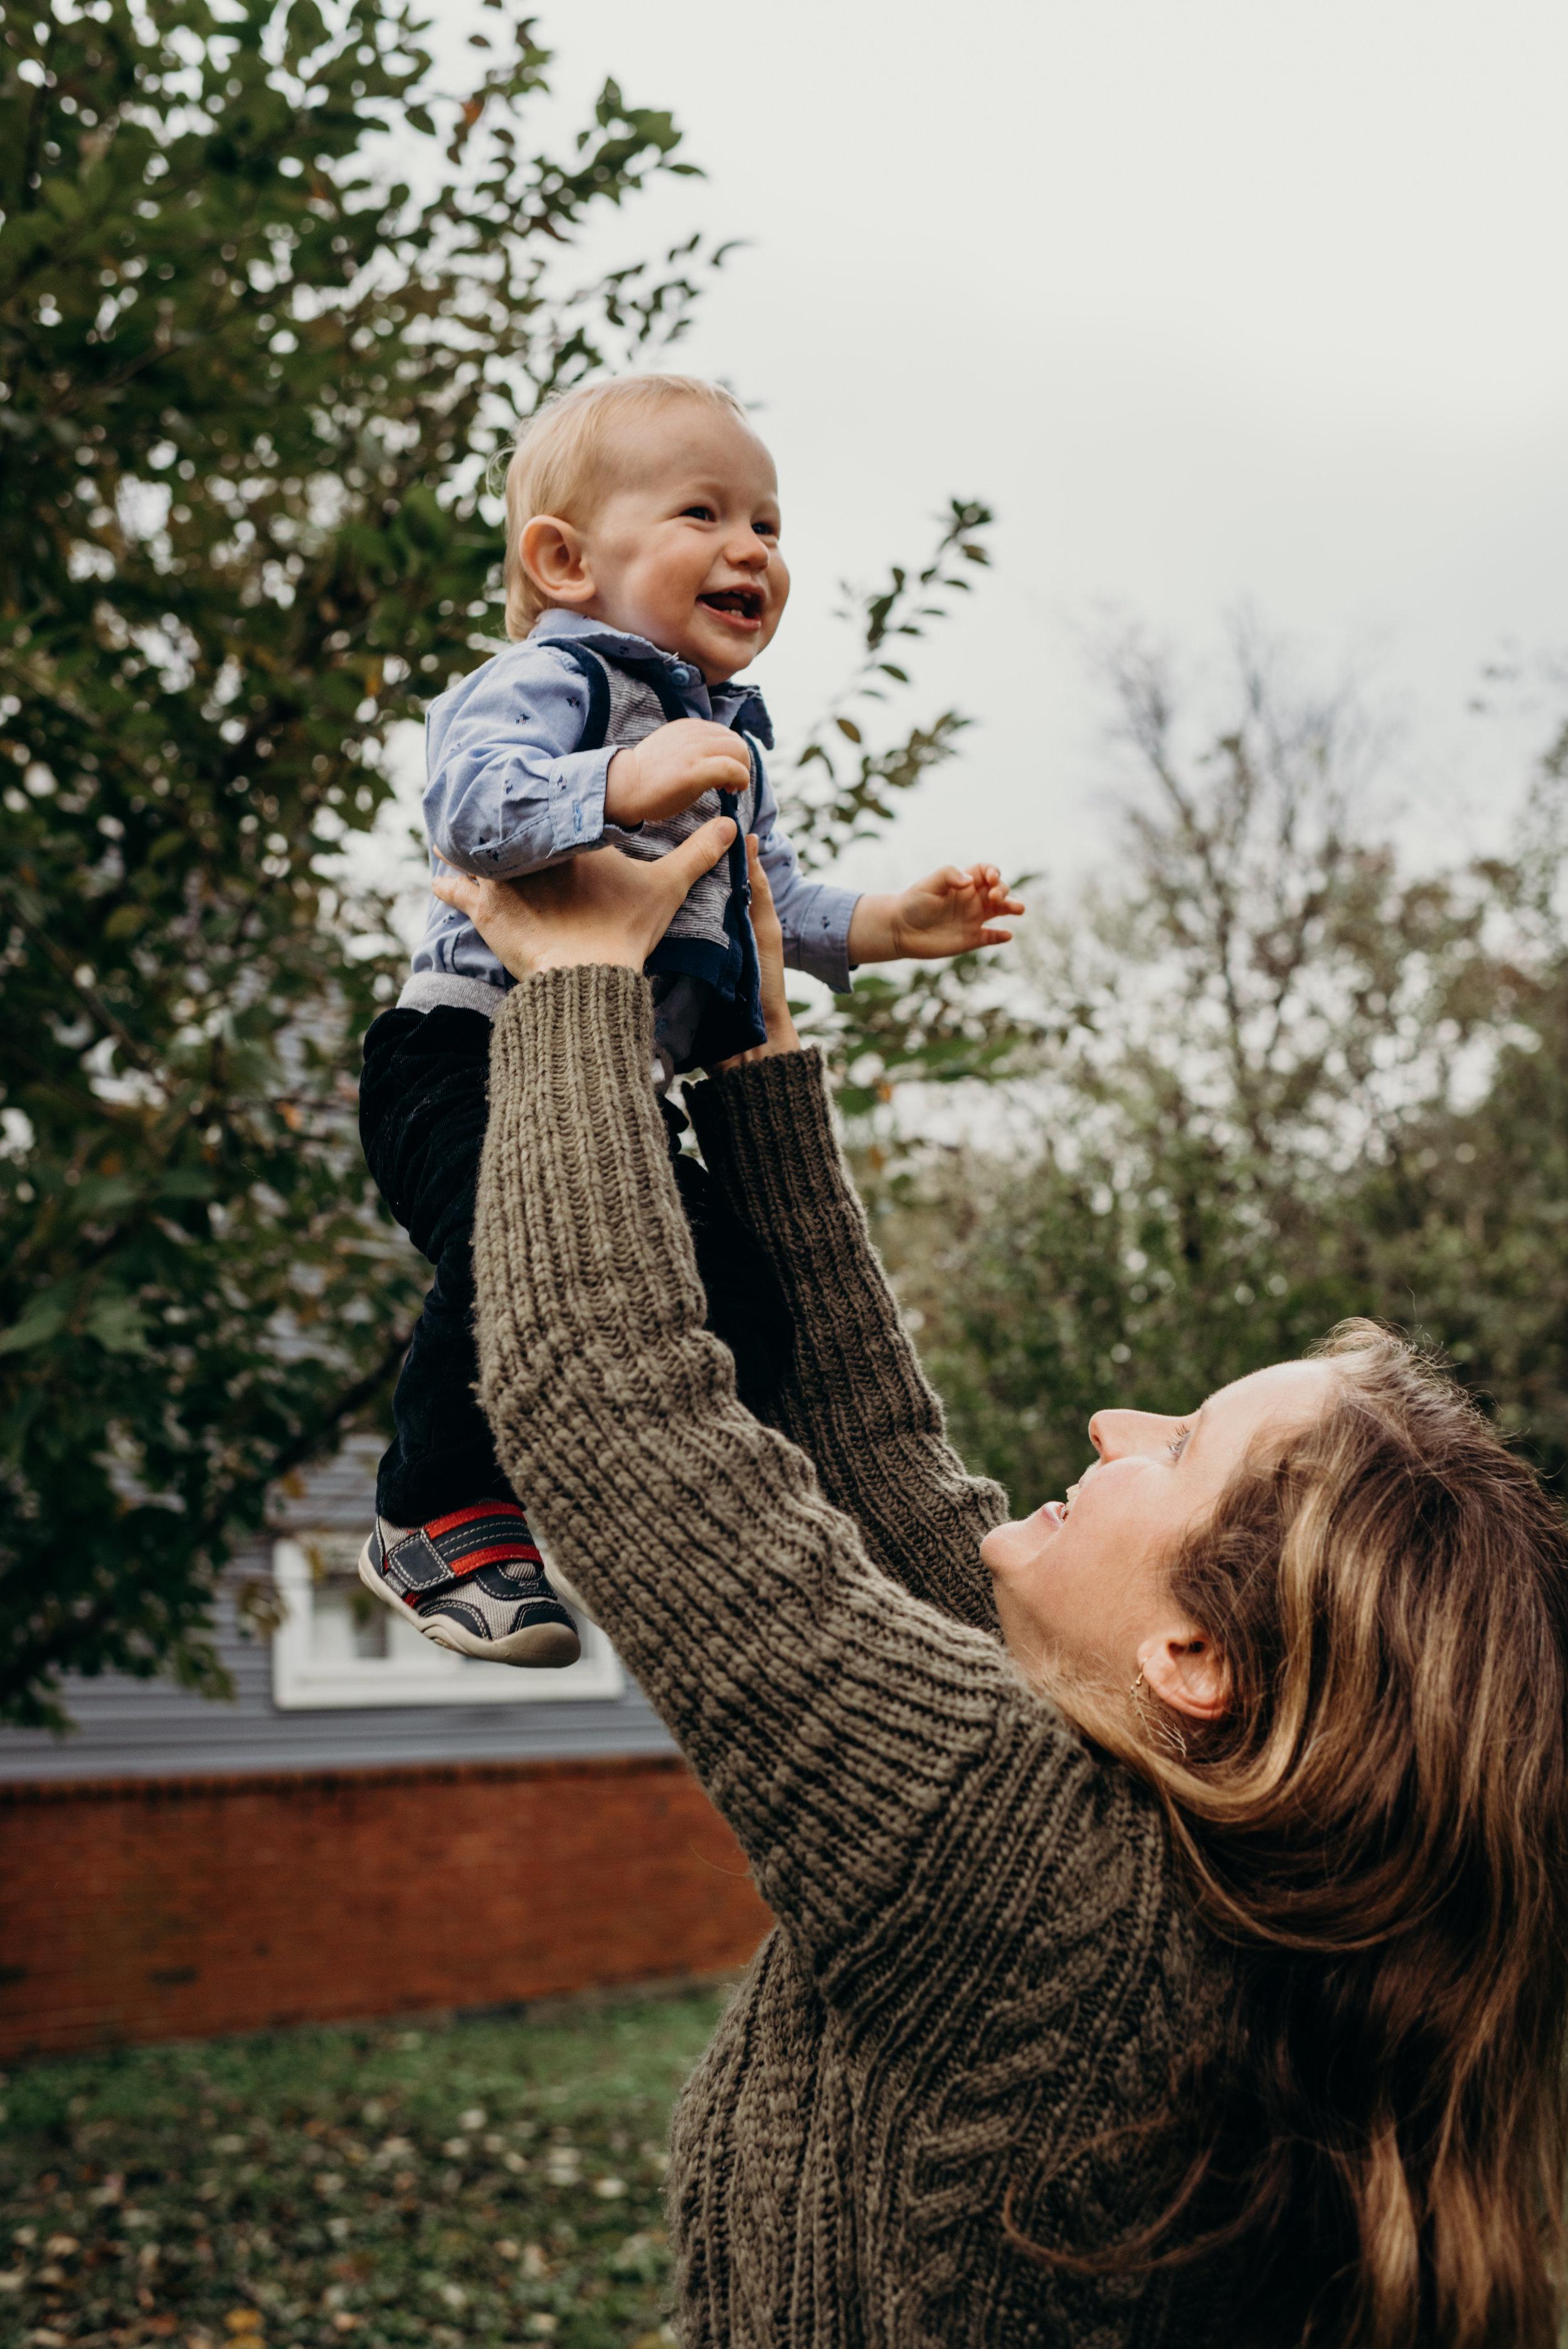 dc-maryland-lifestyle-natural-family-photographer-megan-graham